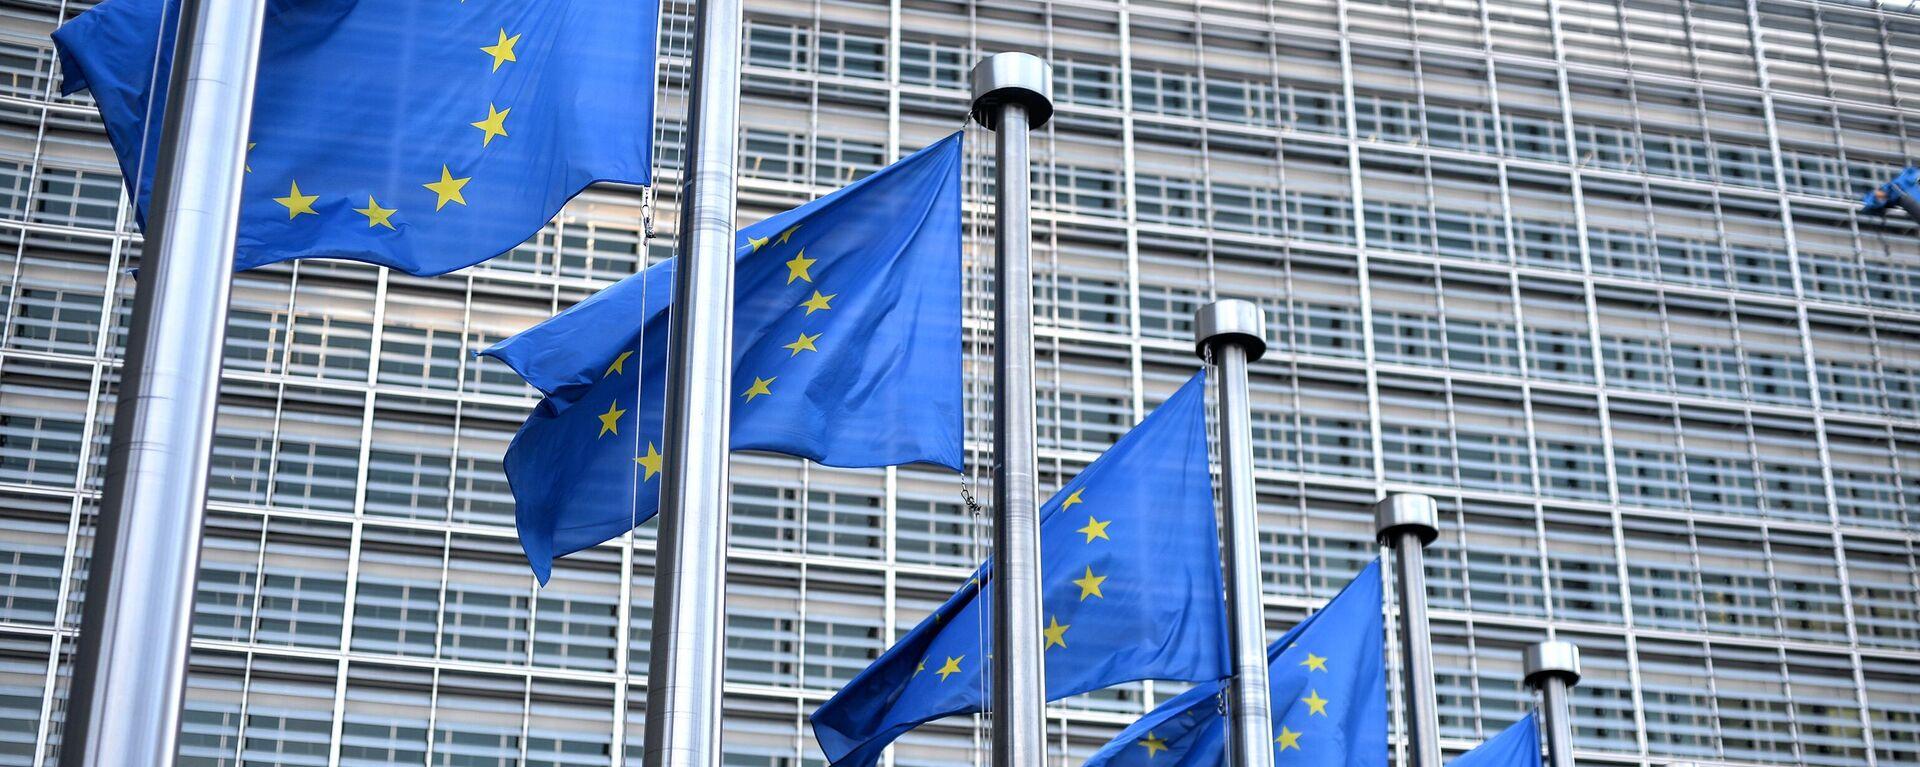 Hauptquartier der EU-Kommission in Brüssel - SNA, 1920, 24.05.2021